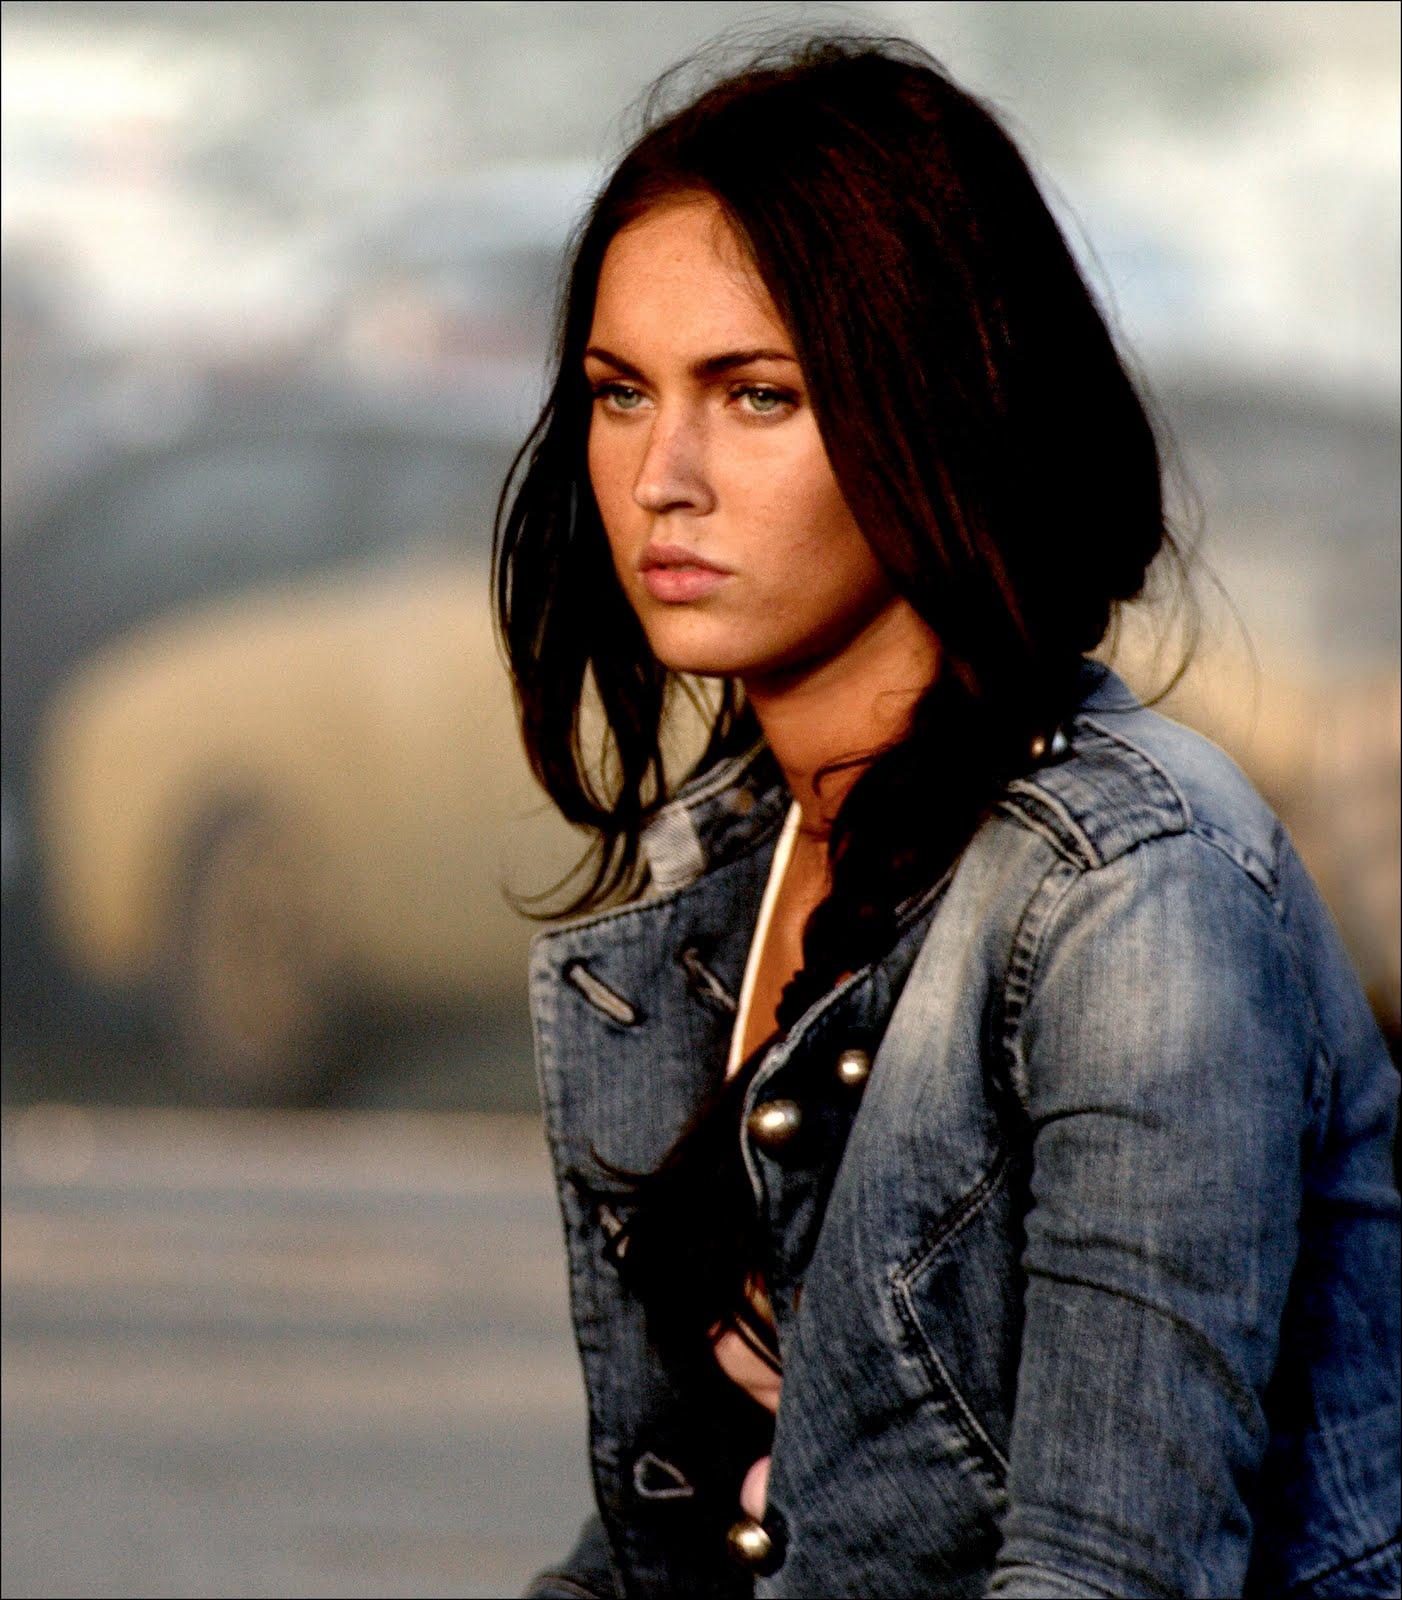 http://4.bp.blogspot.com/_GCAuqodmOE4/TGNsQQWBB7I/AAAAAAAABNE/6CEg7SYOn2k/s1600/Megan_Fox__more_Transformers_stills0002.jpg